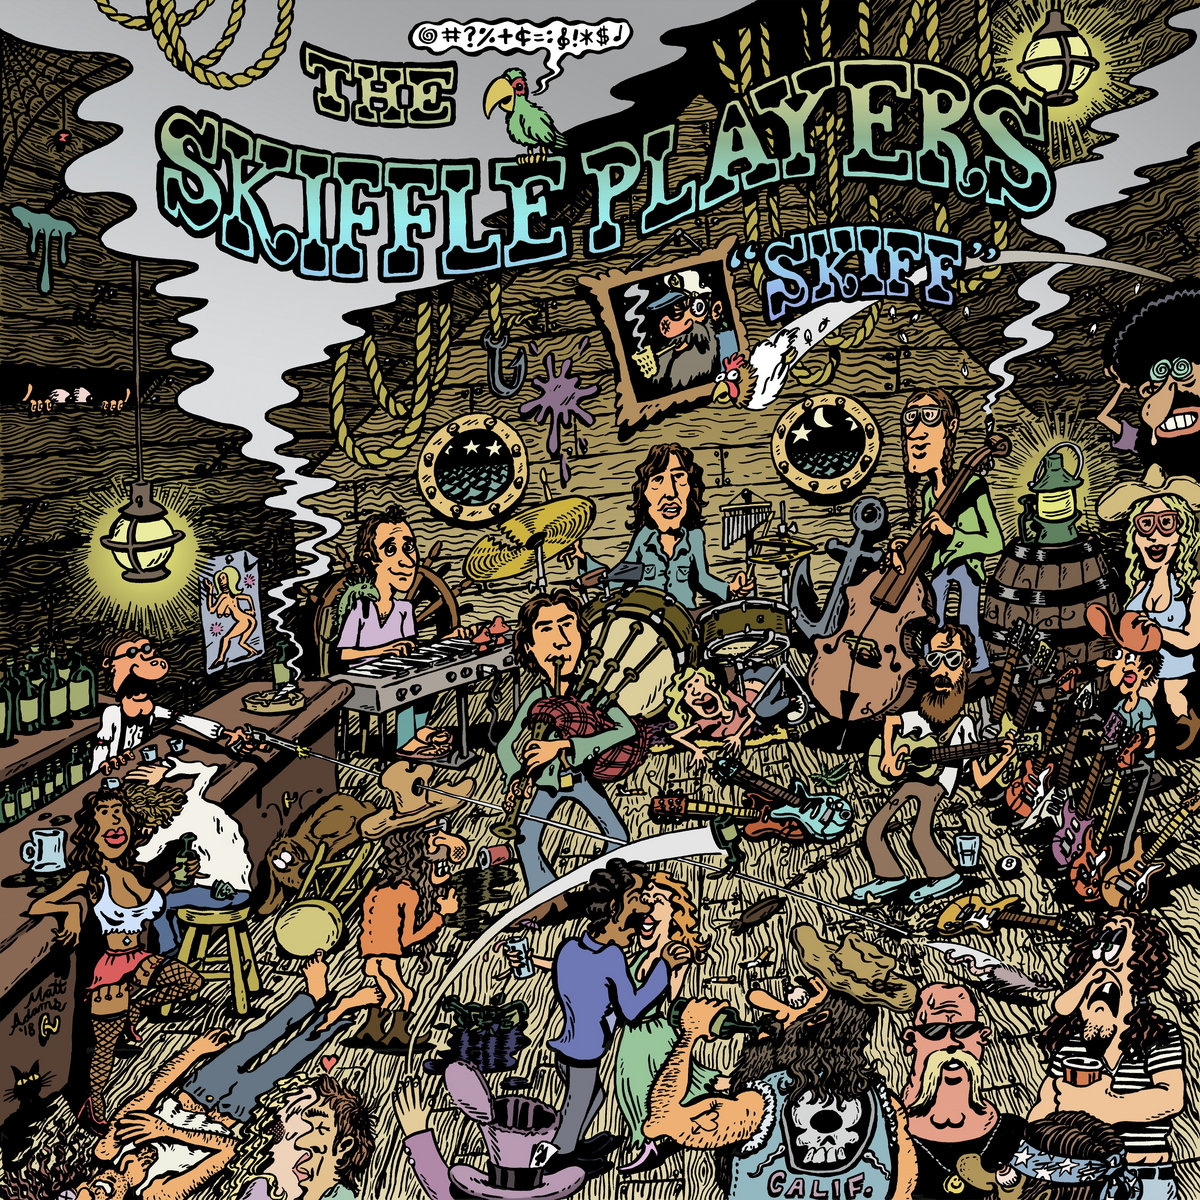 Skiff | The Skiffle Players